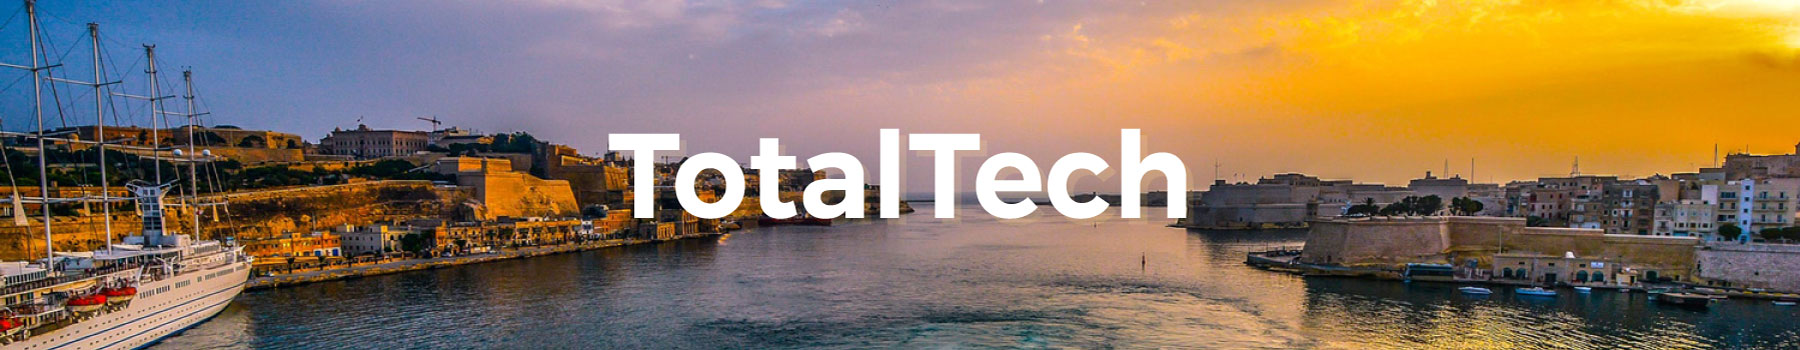 TotalTech